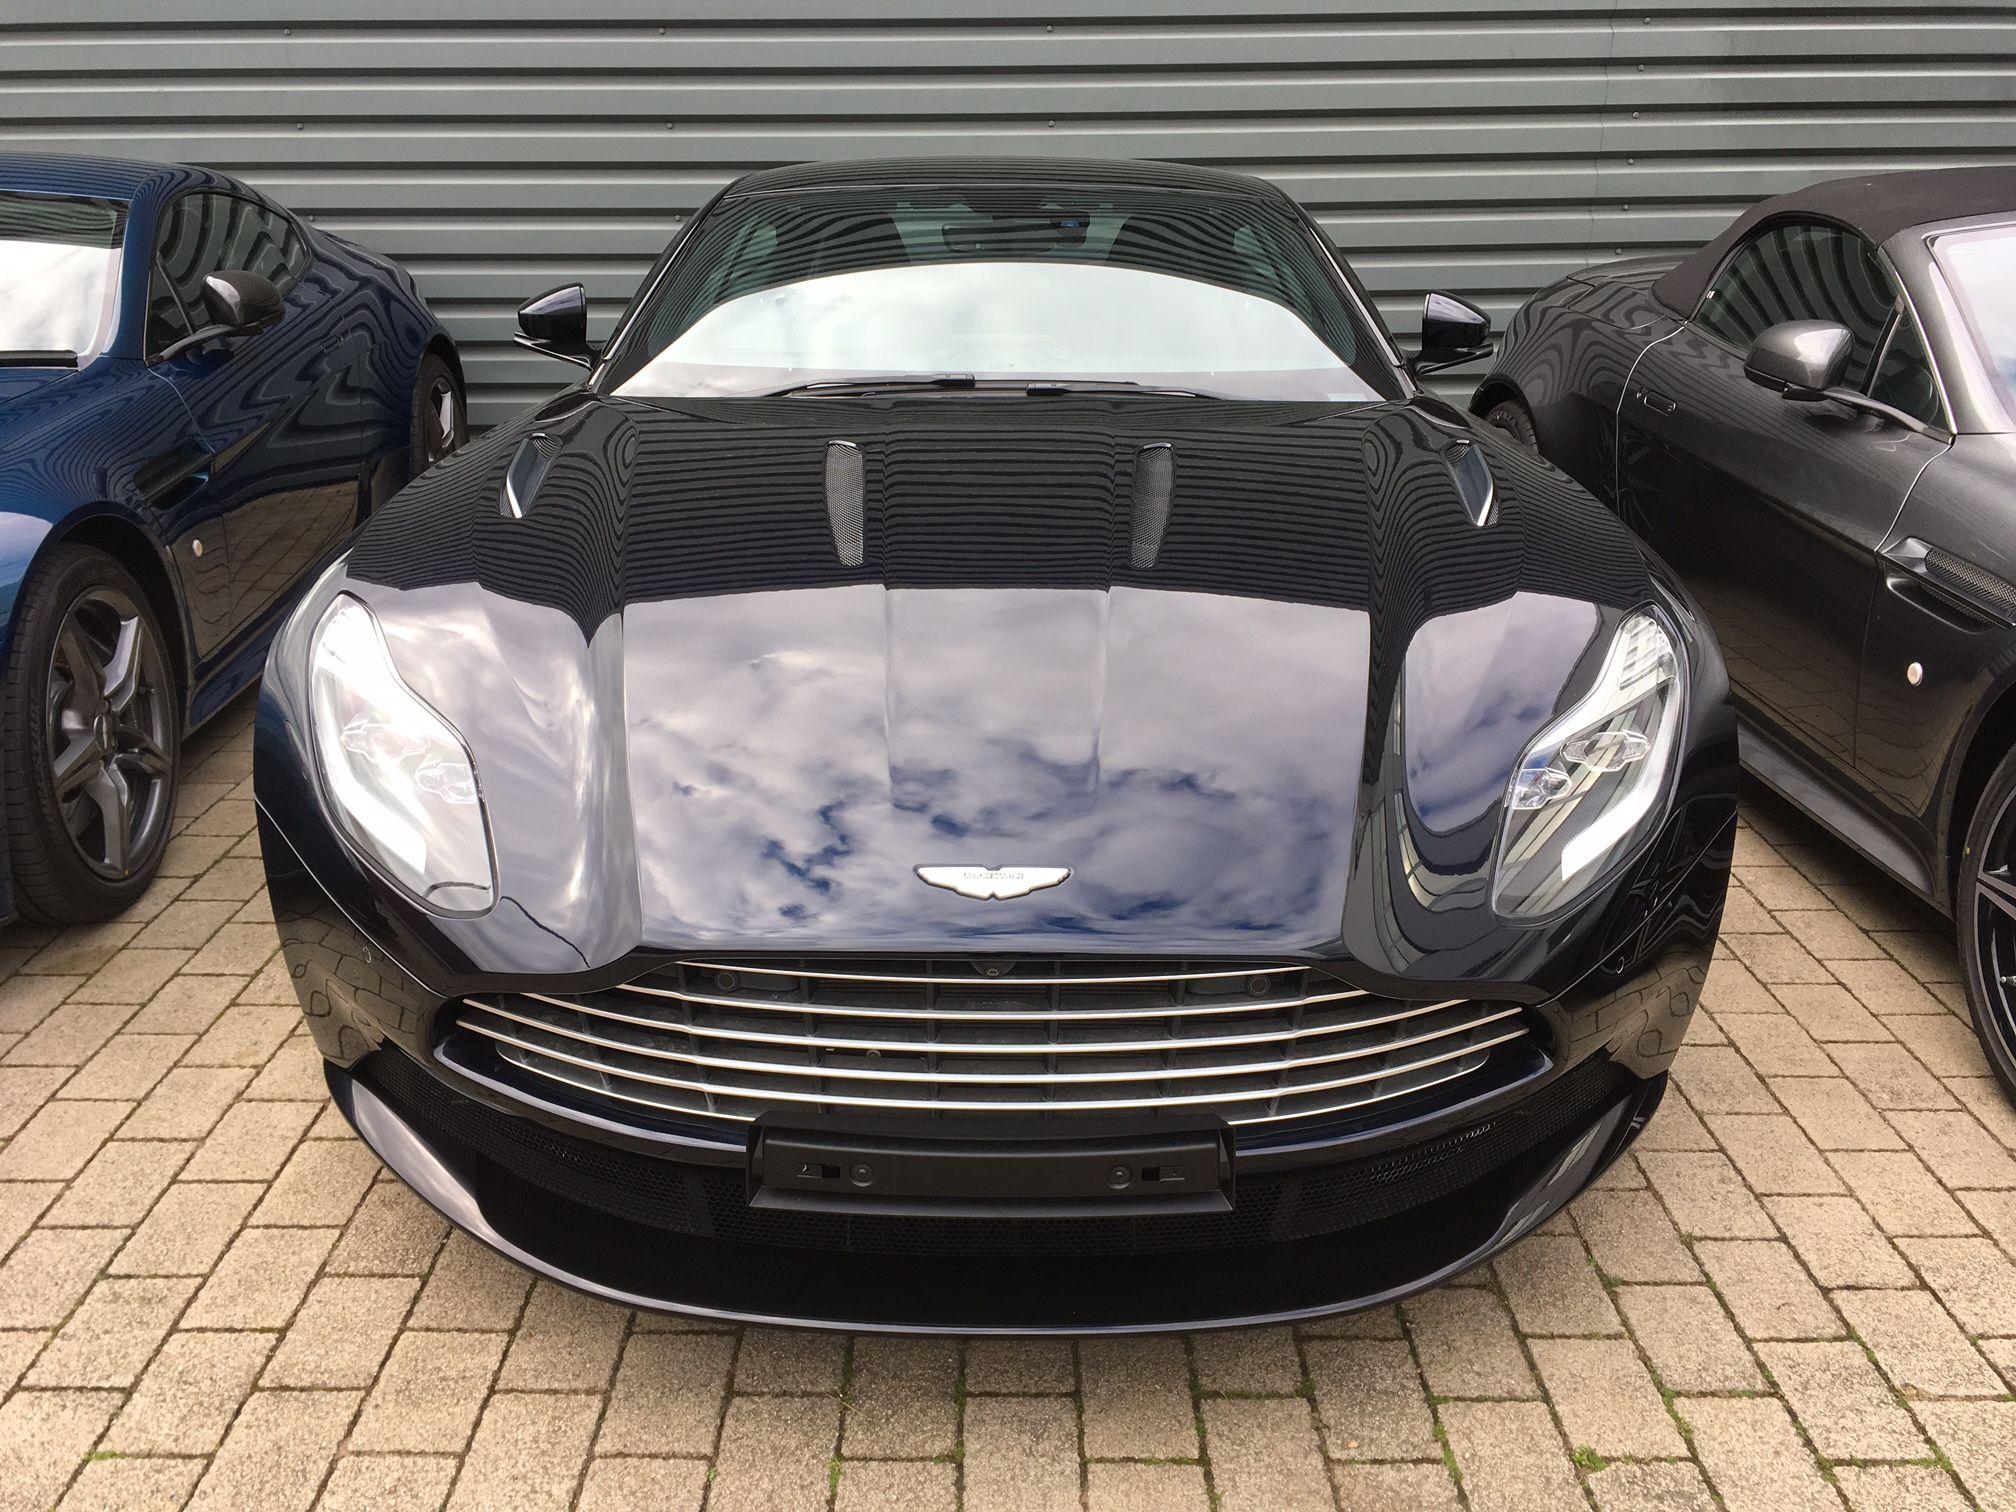 The Aston Martin Db11 Coupe Launch Edition Carleasing Luxury Prestige Car Lease Business Person Aston Martin Db11